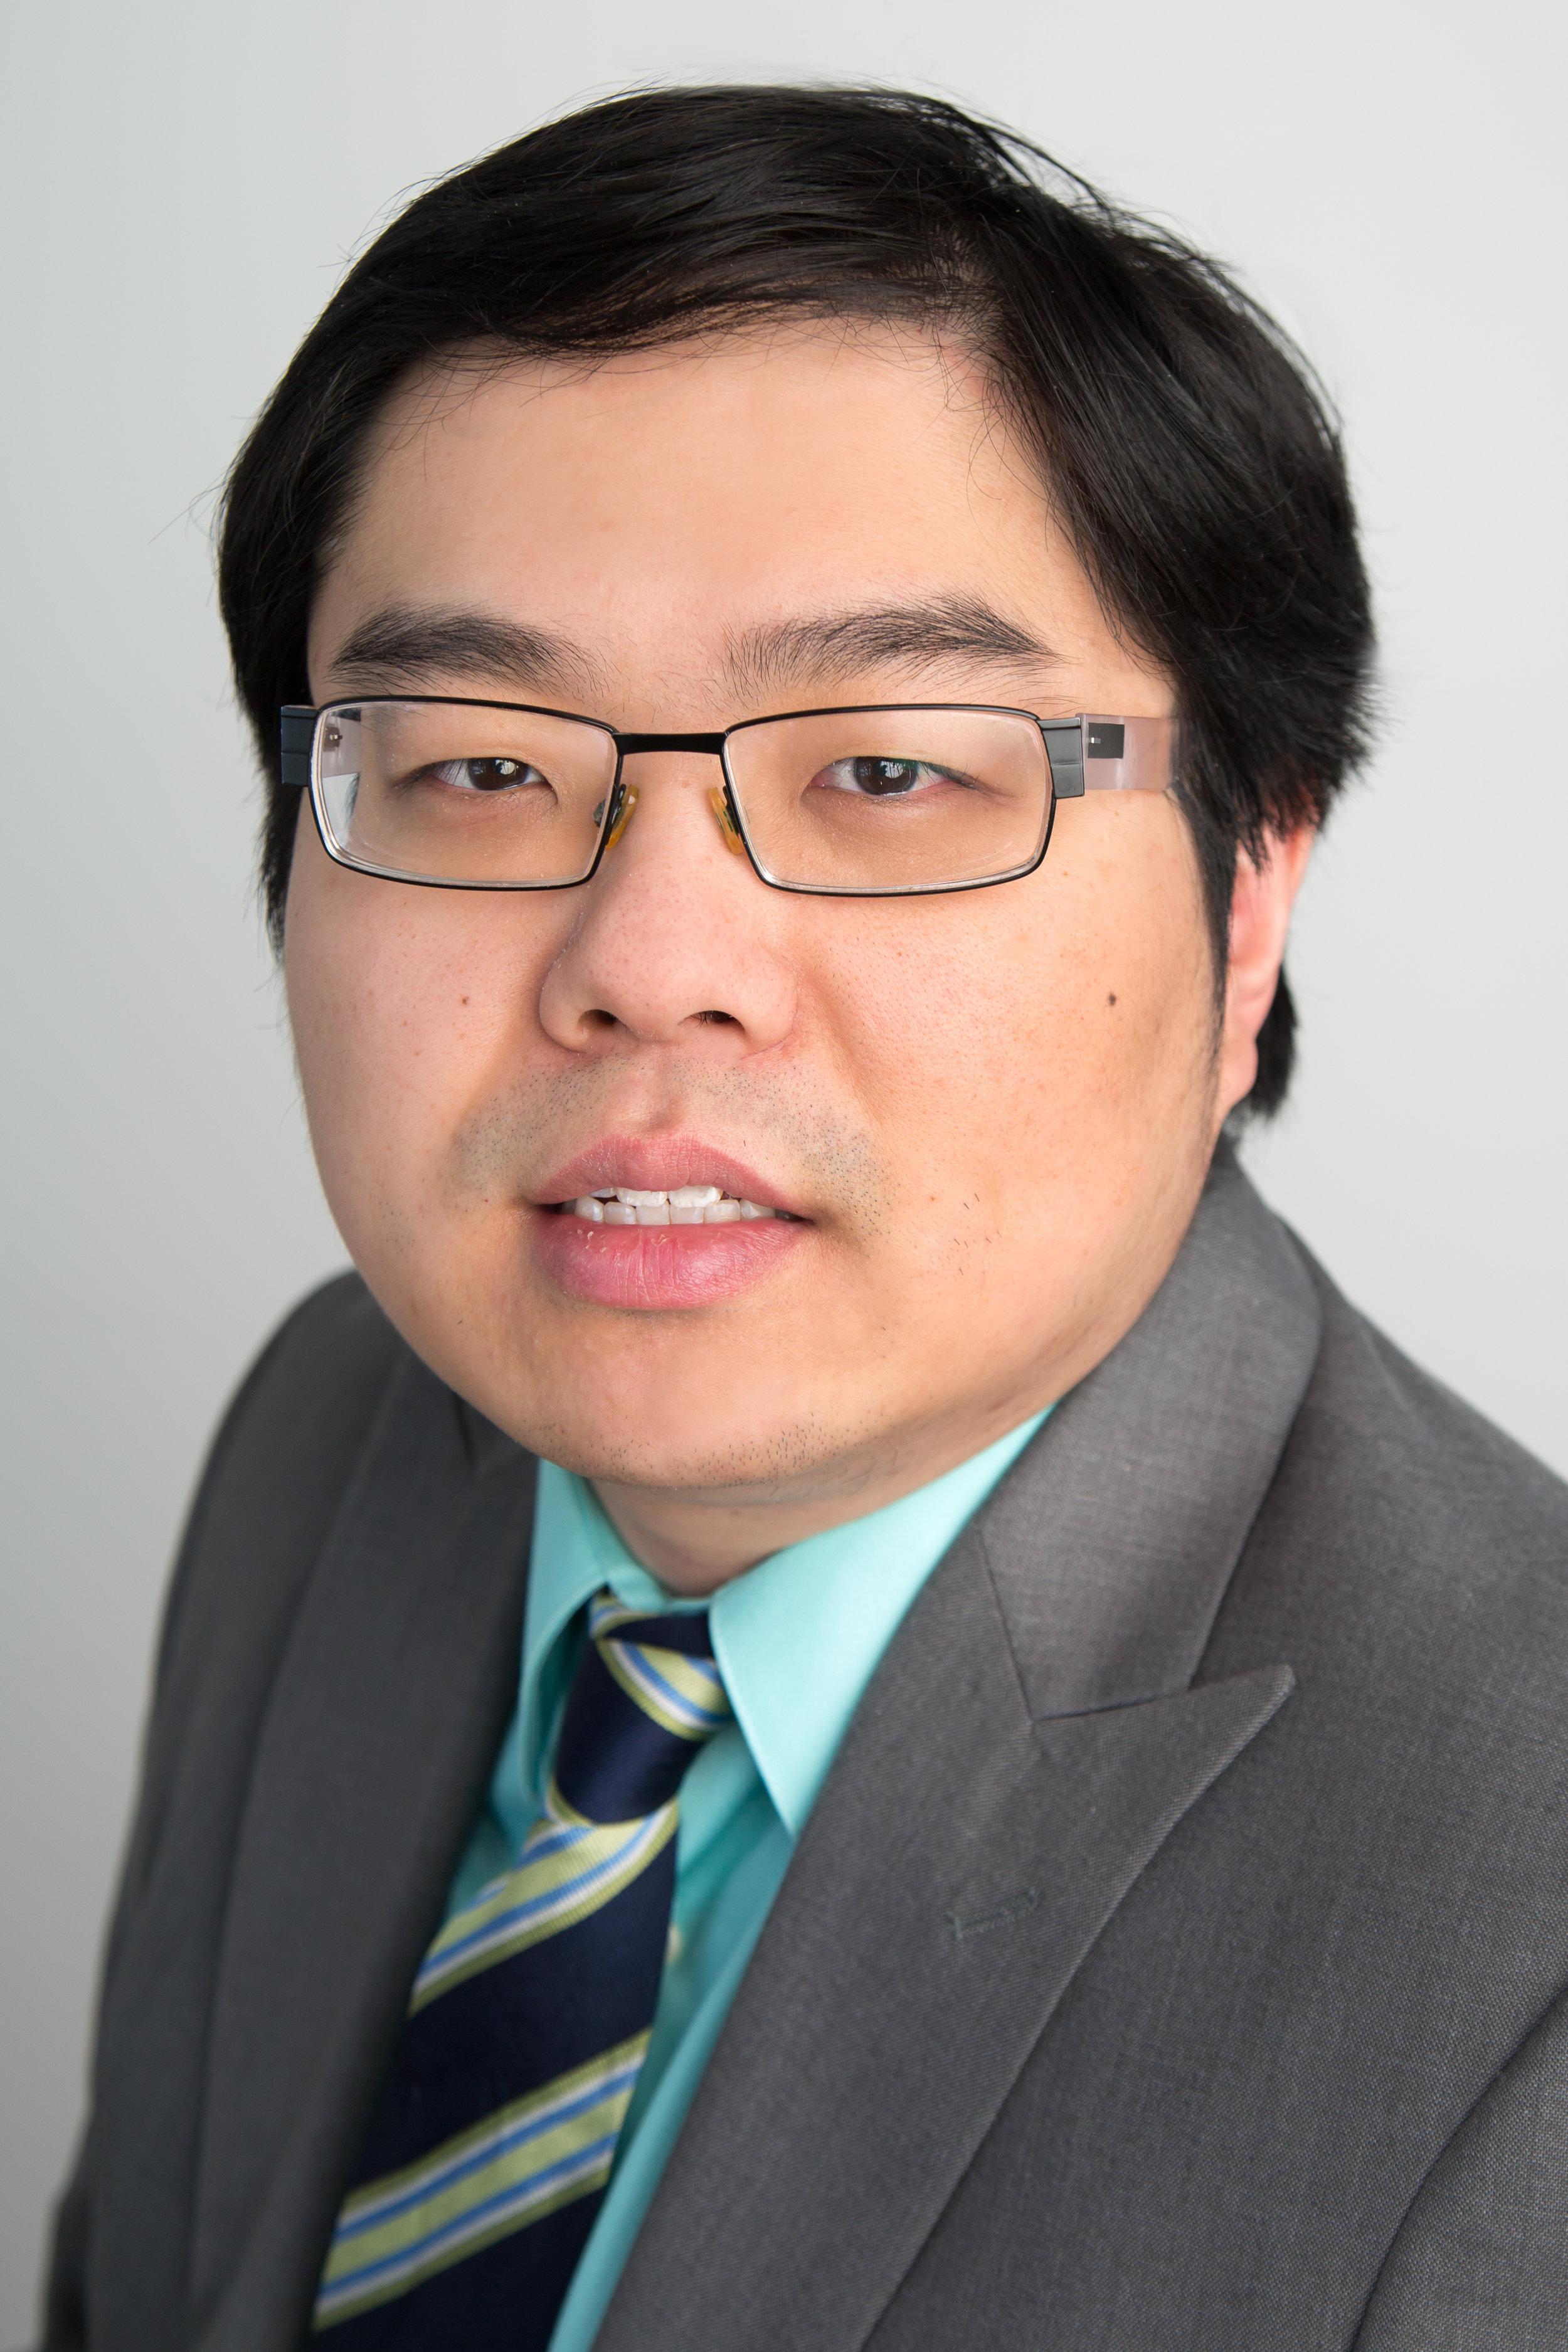 William Huynh, lac acupuncturist.jpg